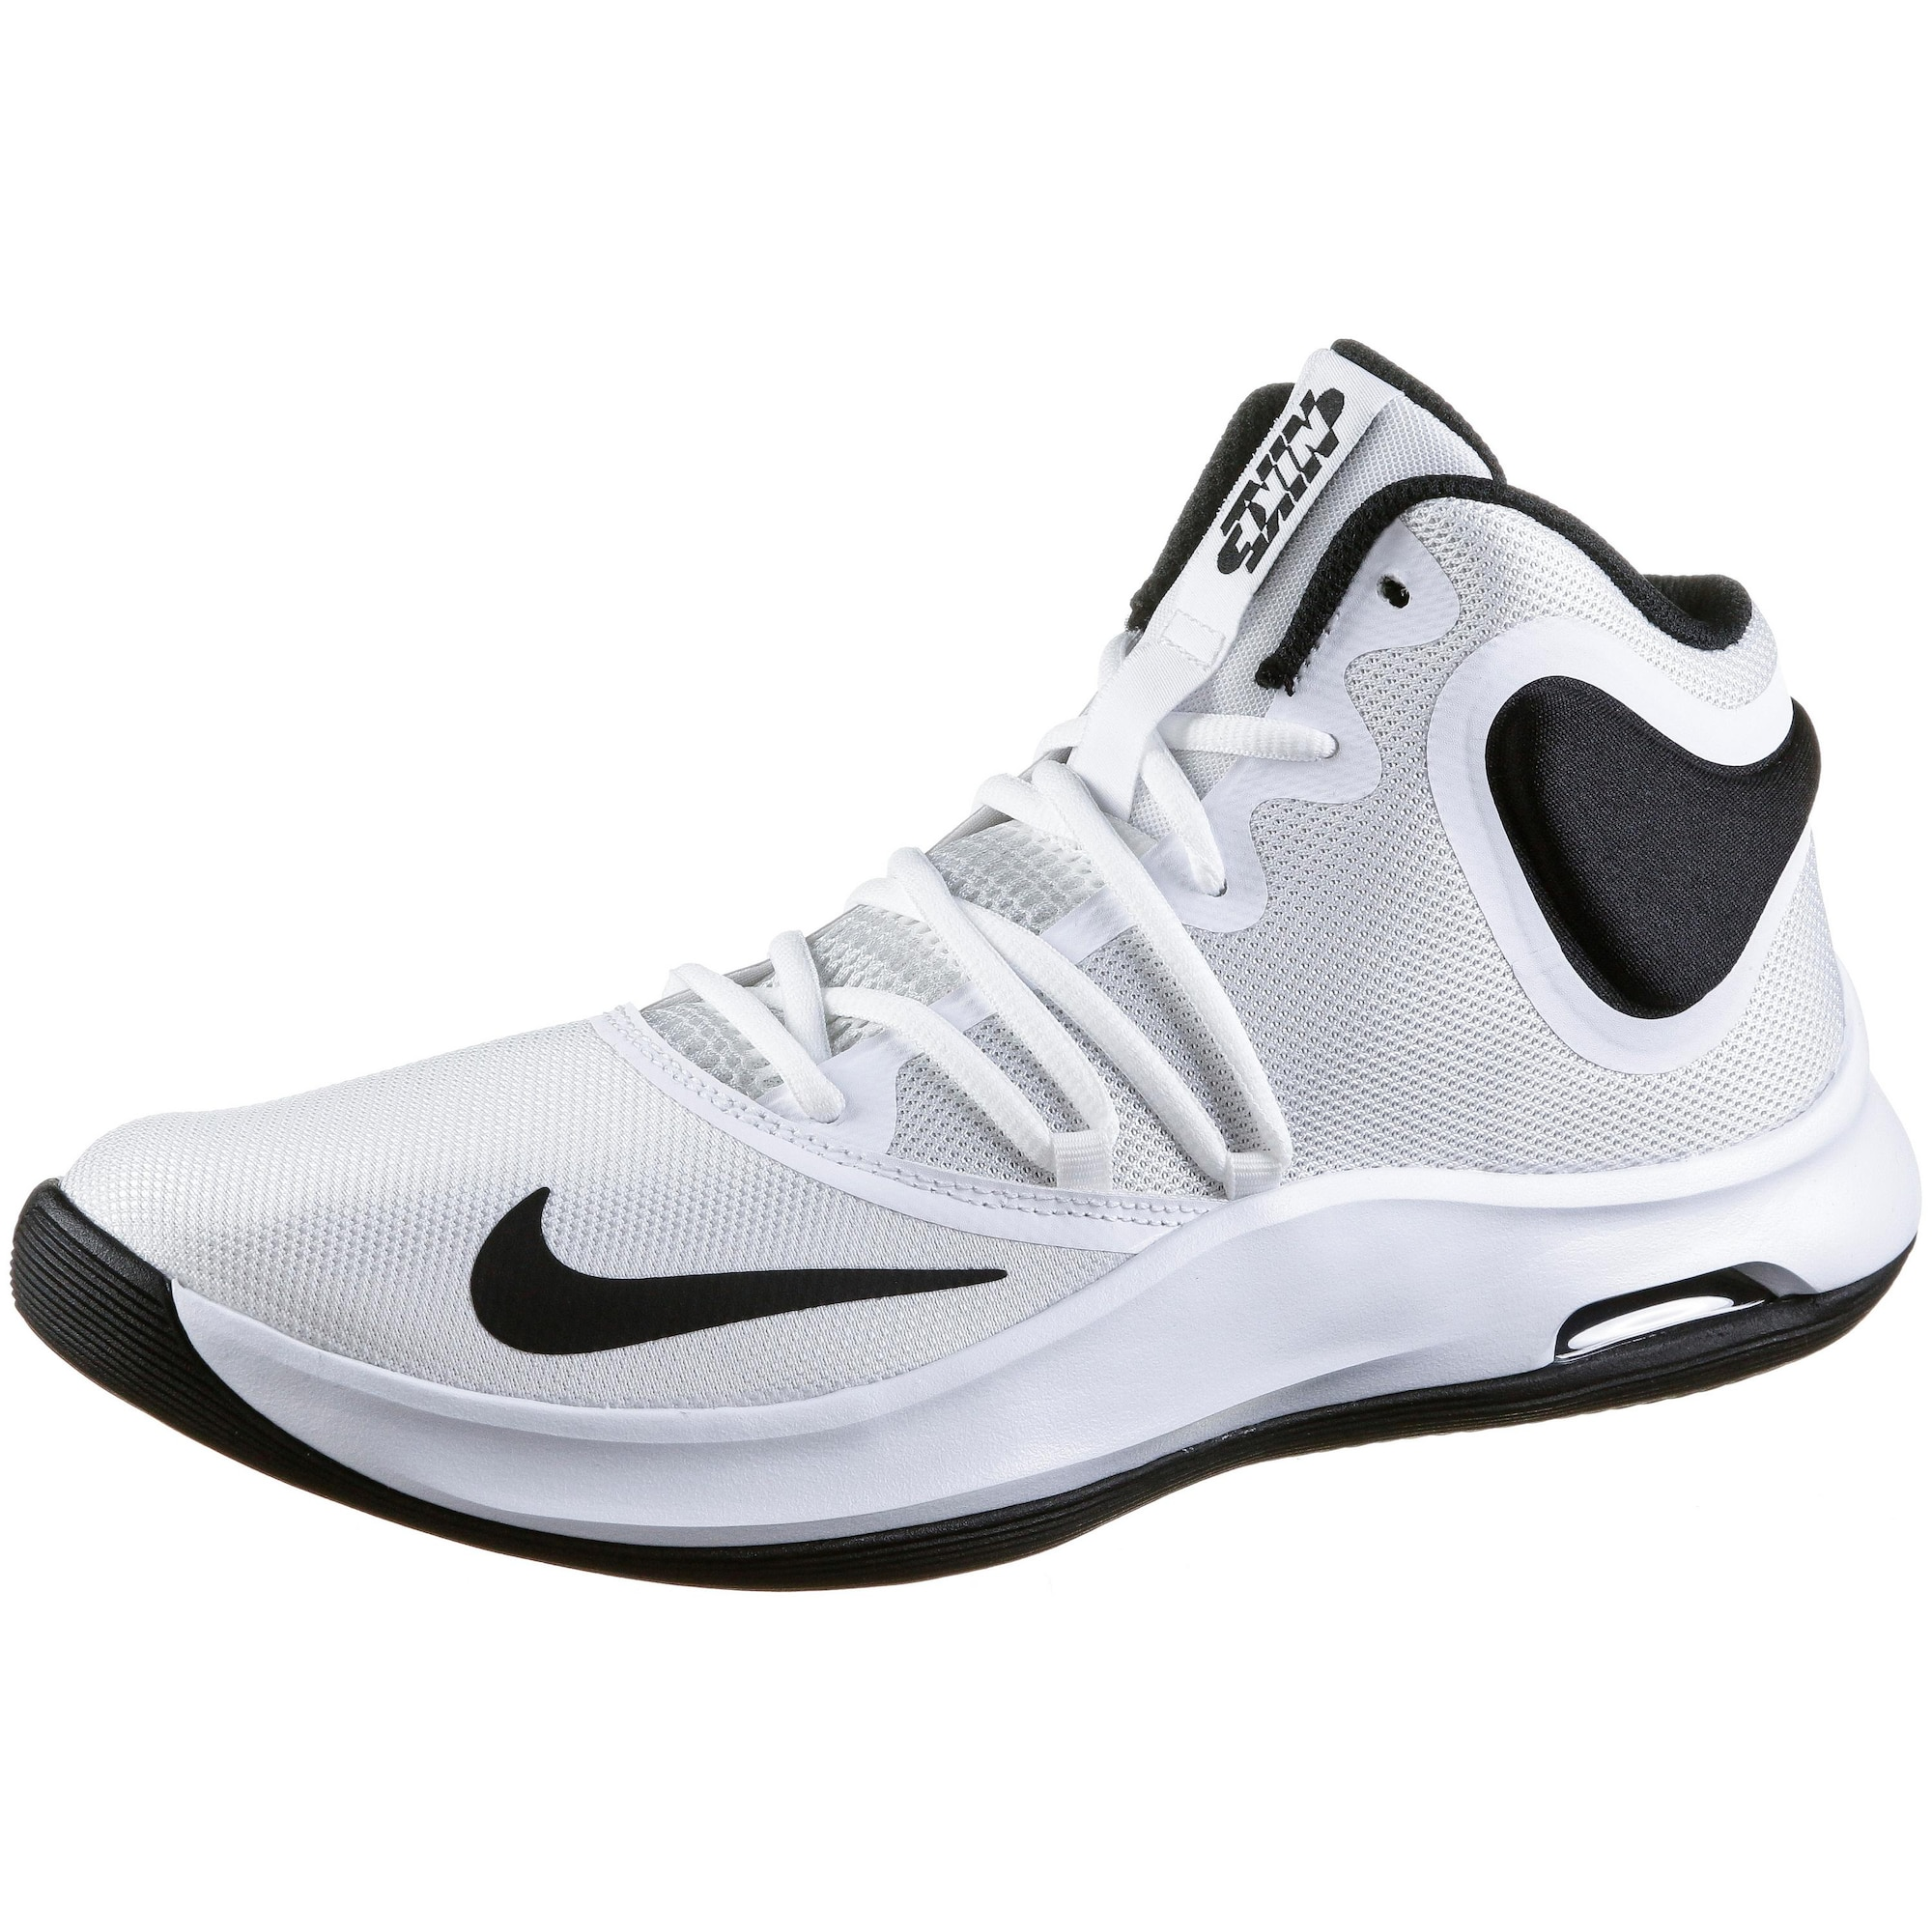 Basketballschuhe 'Air Versitile IV' | Schuhe > Sportschuhe > Basketballschuhe | Nike